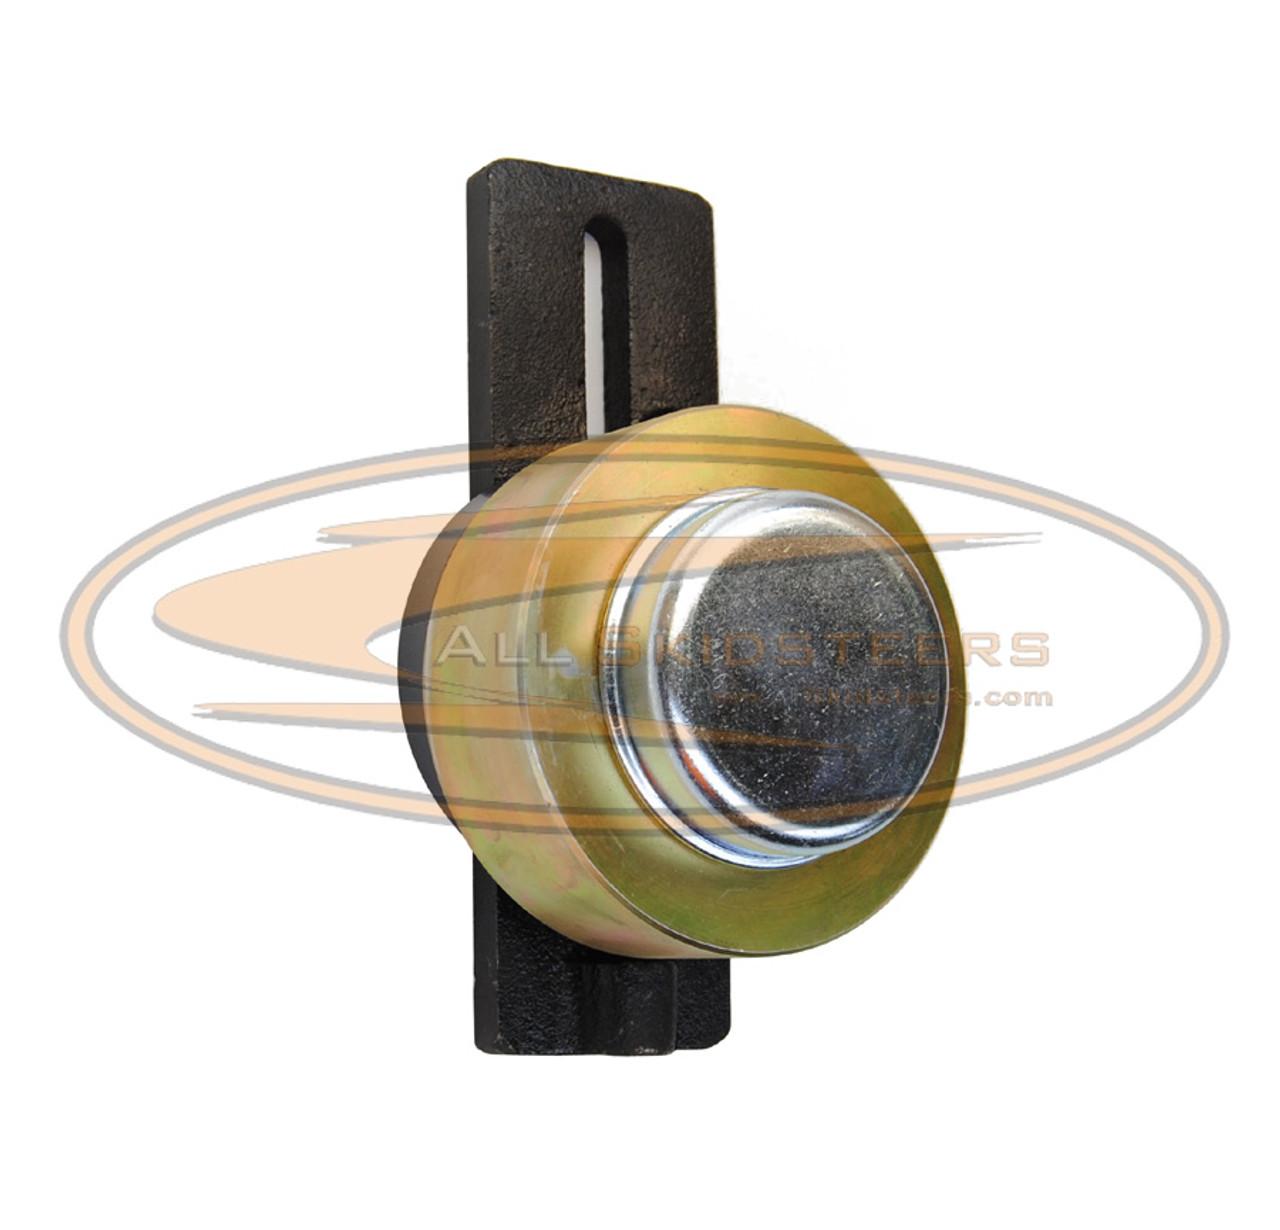 drive belt tensioner pulley for bobcat toolcat 5600 replaces oem 6735884 all skidsteers inc. Black Bedroom Furniture Sets. Home Design Ideas